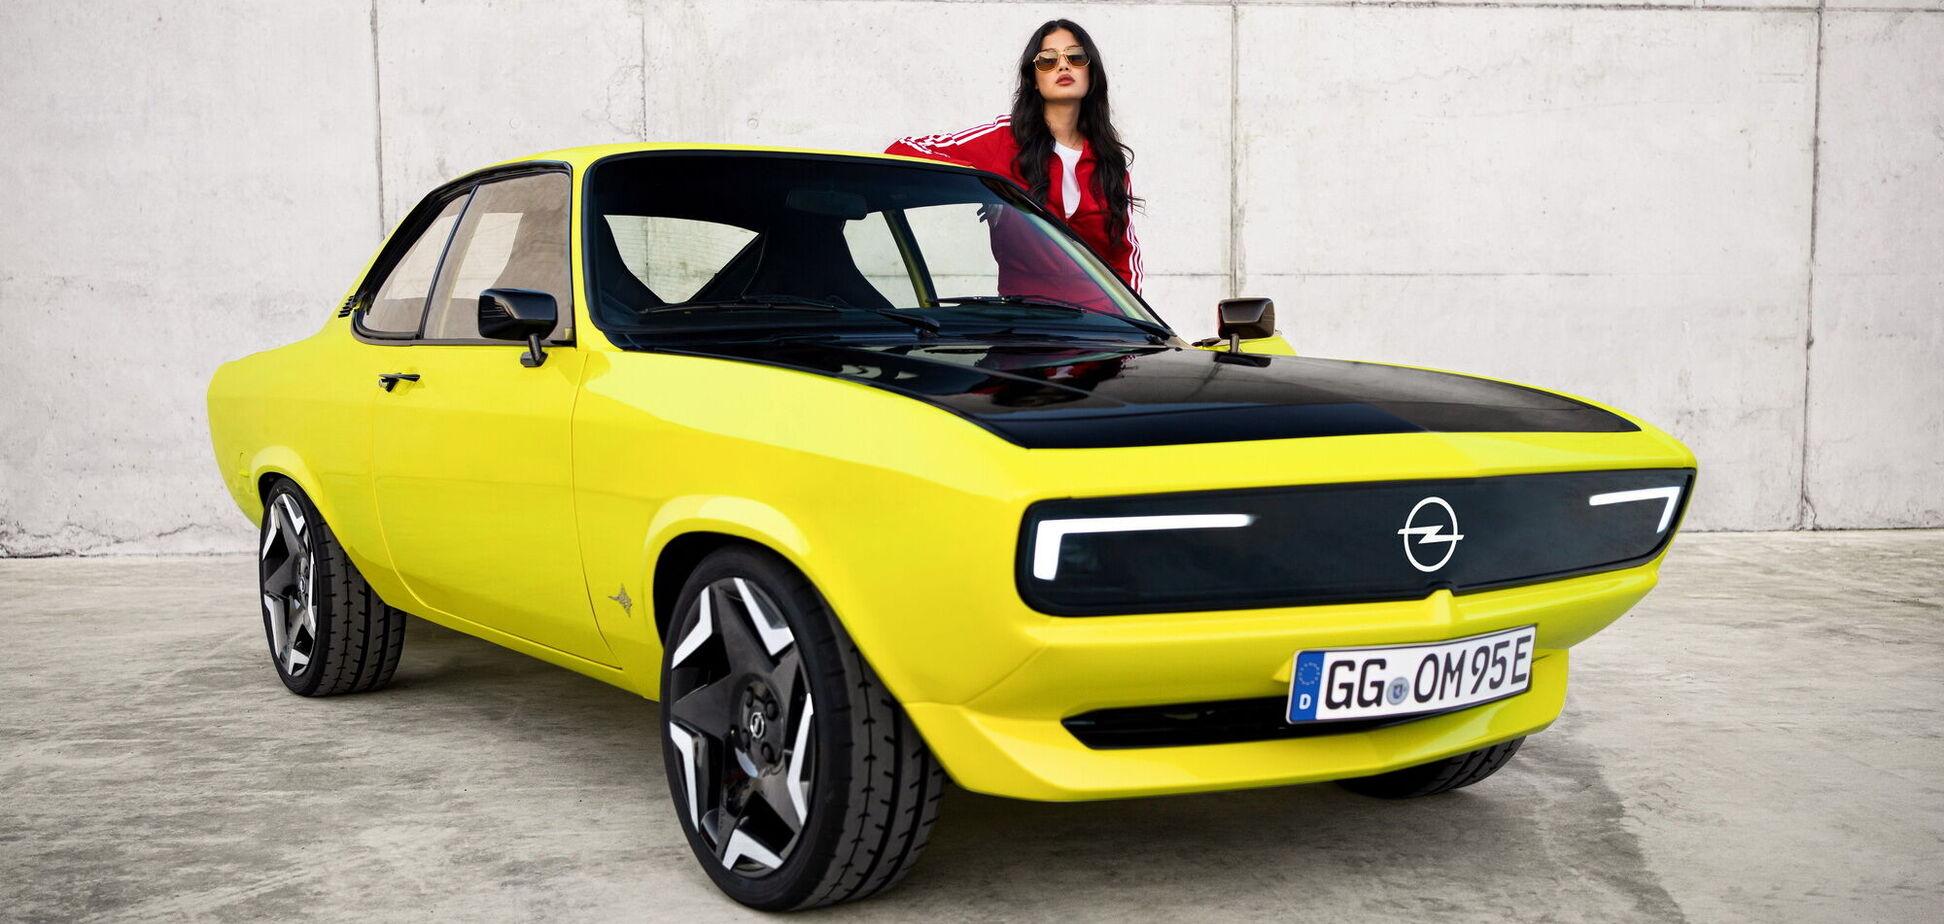 Opel презентовал электрический рестомод Manta